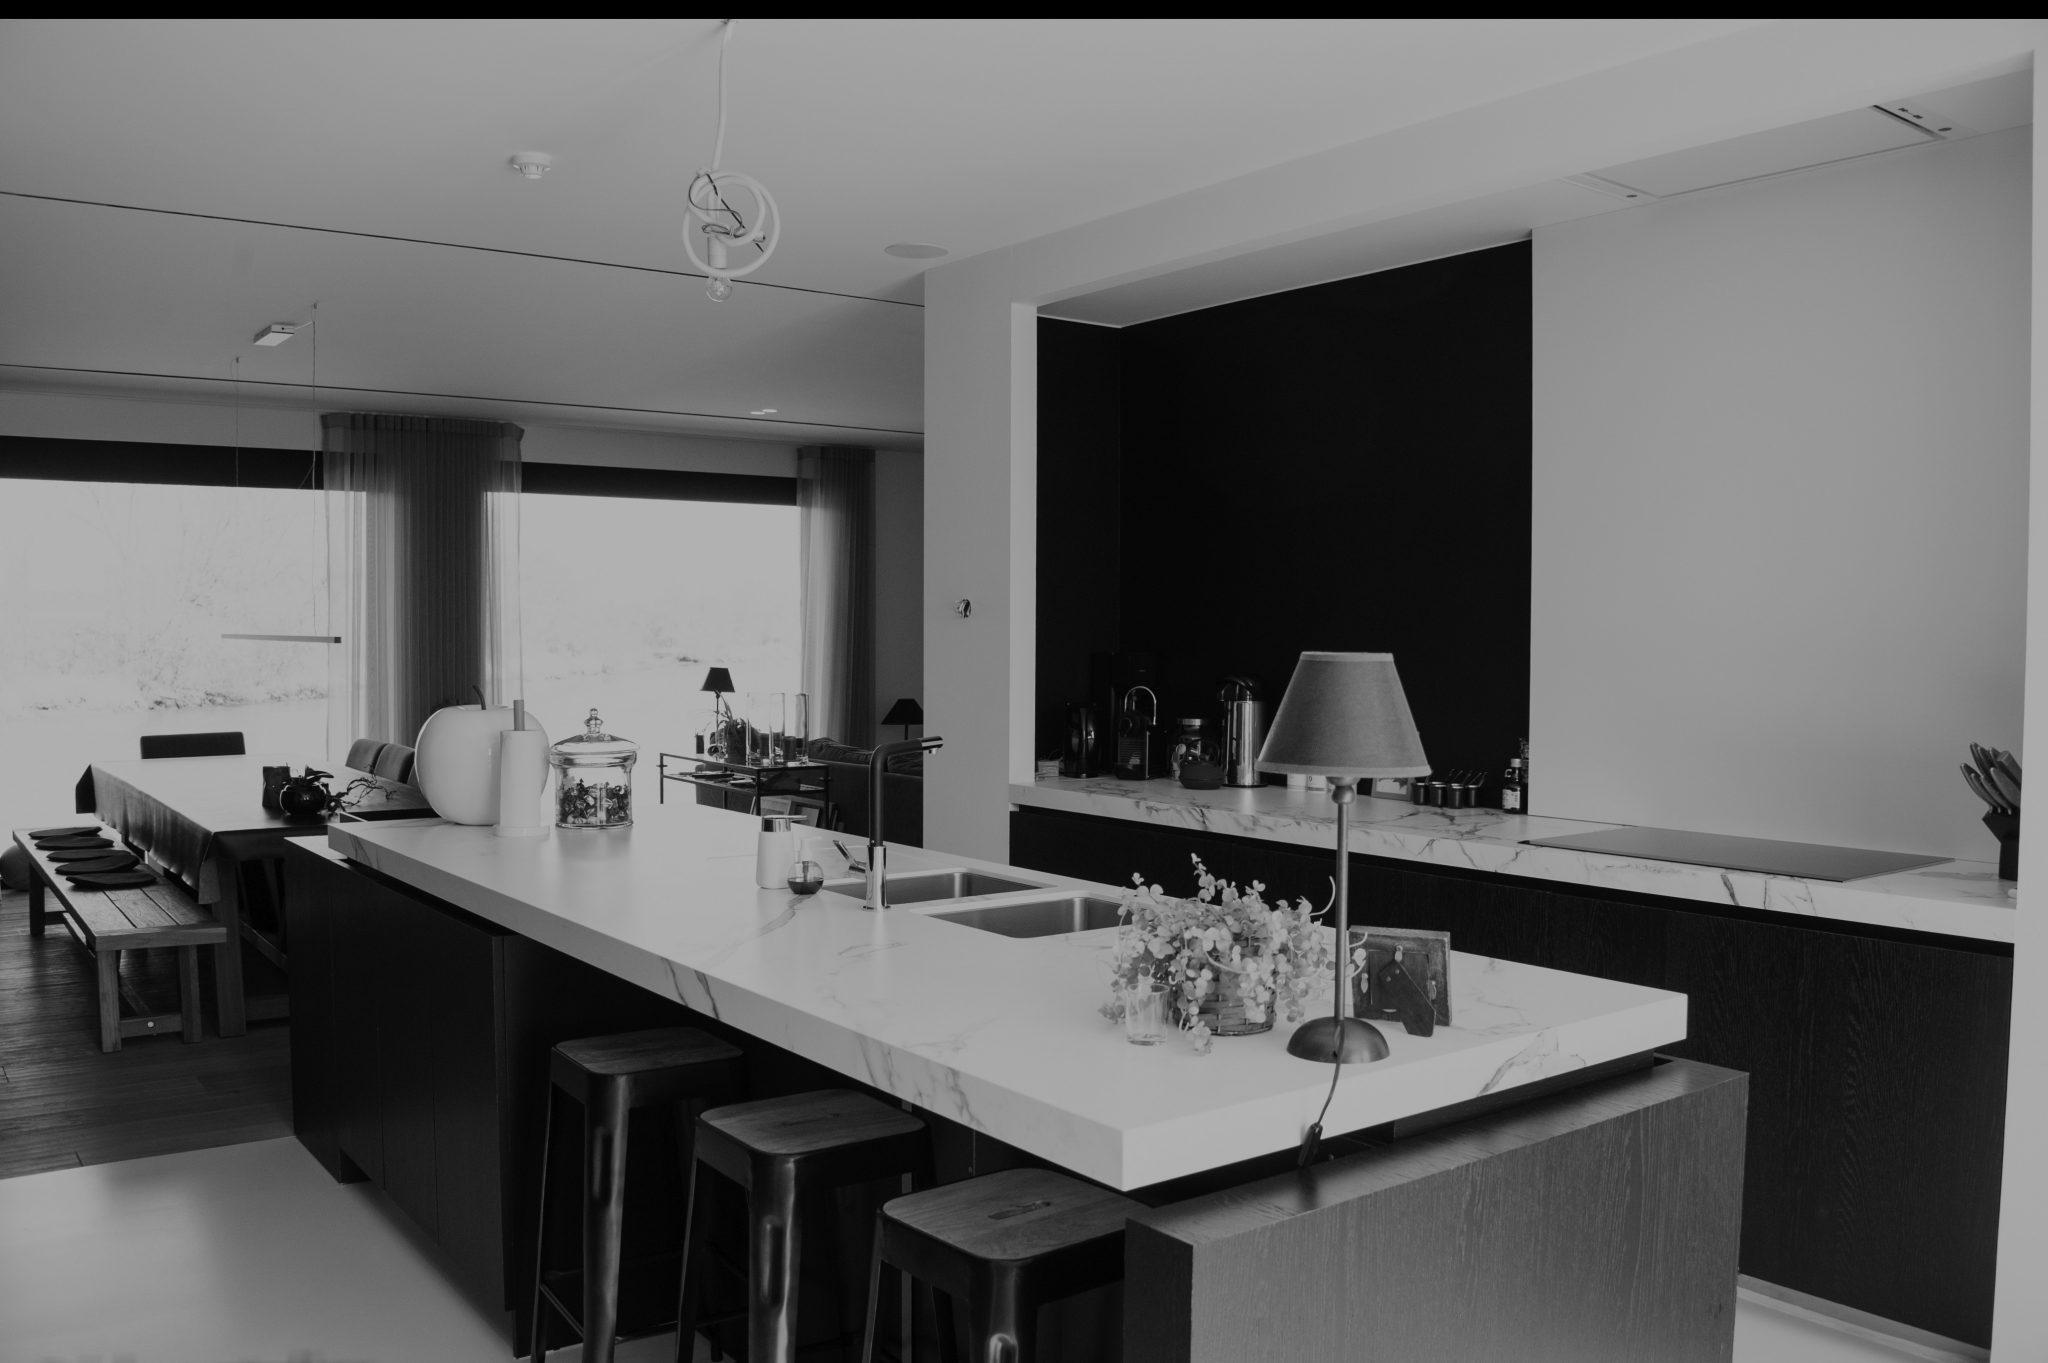 Lampade tessuto creativo - Keuken kleur idee ...